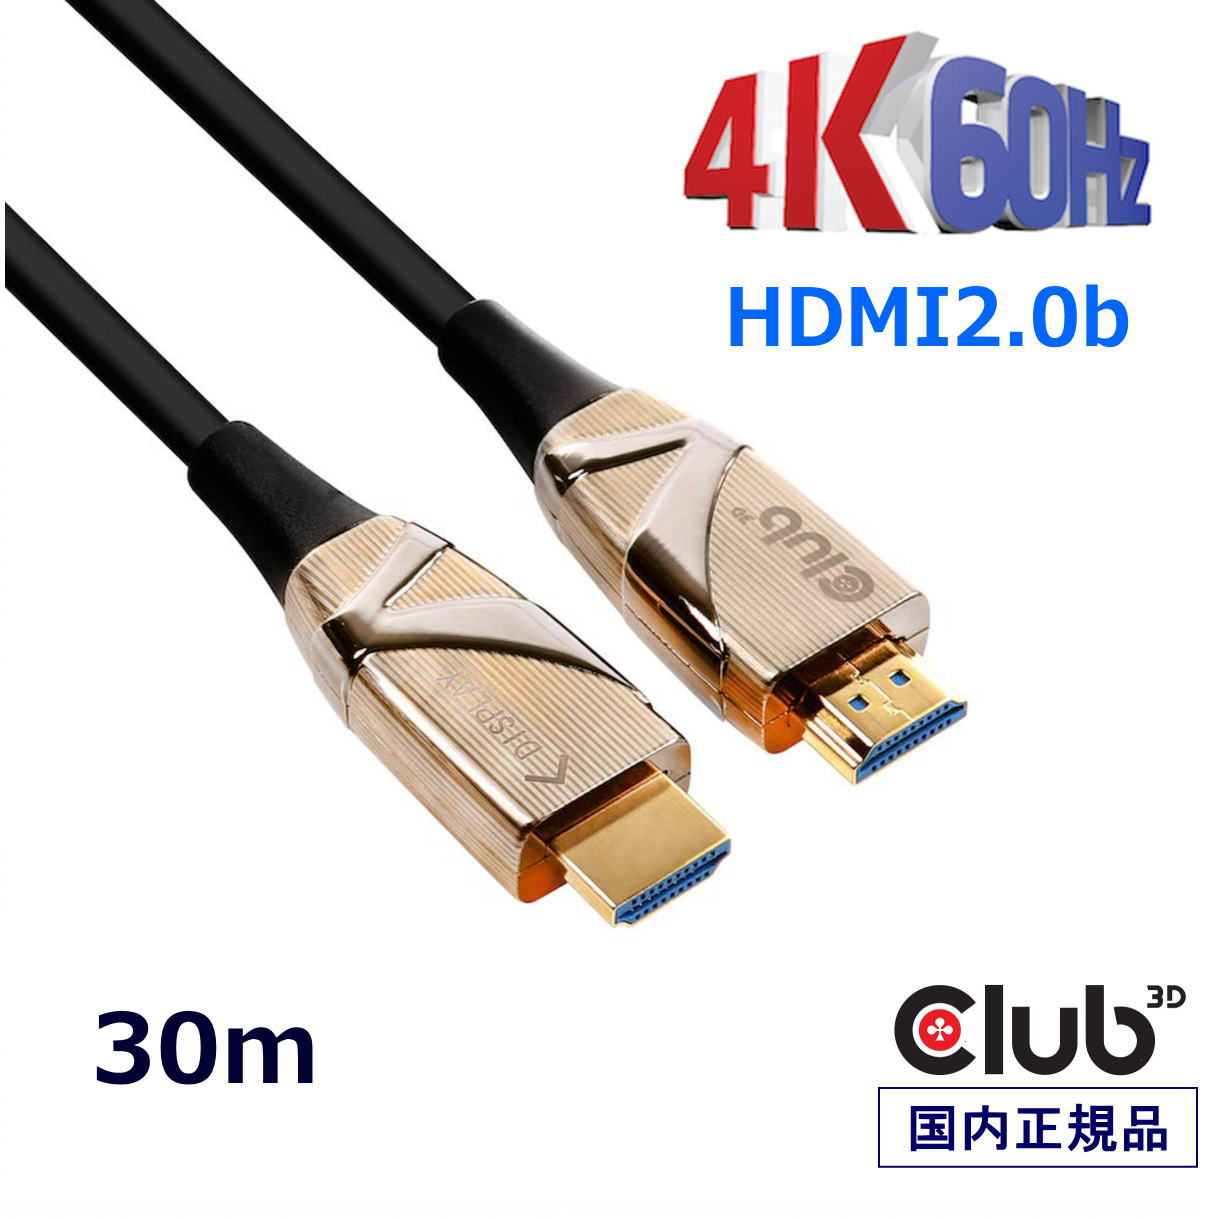 HDMIケーブル 30m AV機器 いよいよ人気ブランド ゲーム機器向け4K60Hz HDMI2.0 ケーブル 国内正規品 Club3D HDMI 2.0 4K 60Hz Hybrid 爆売り 光 Calble Male Make ハイブリッド アクティブ Active HDR CAC-1390 Optical